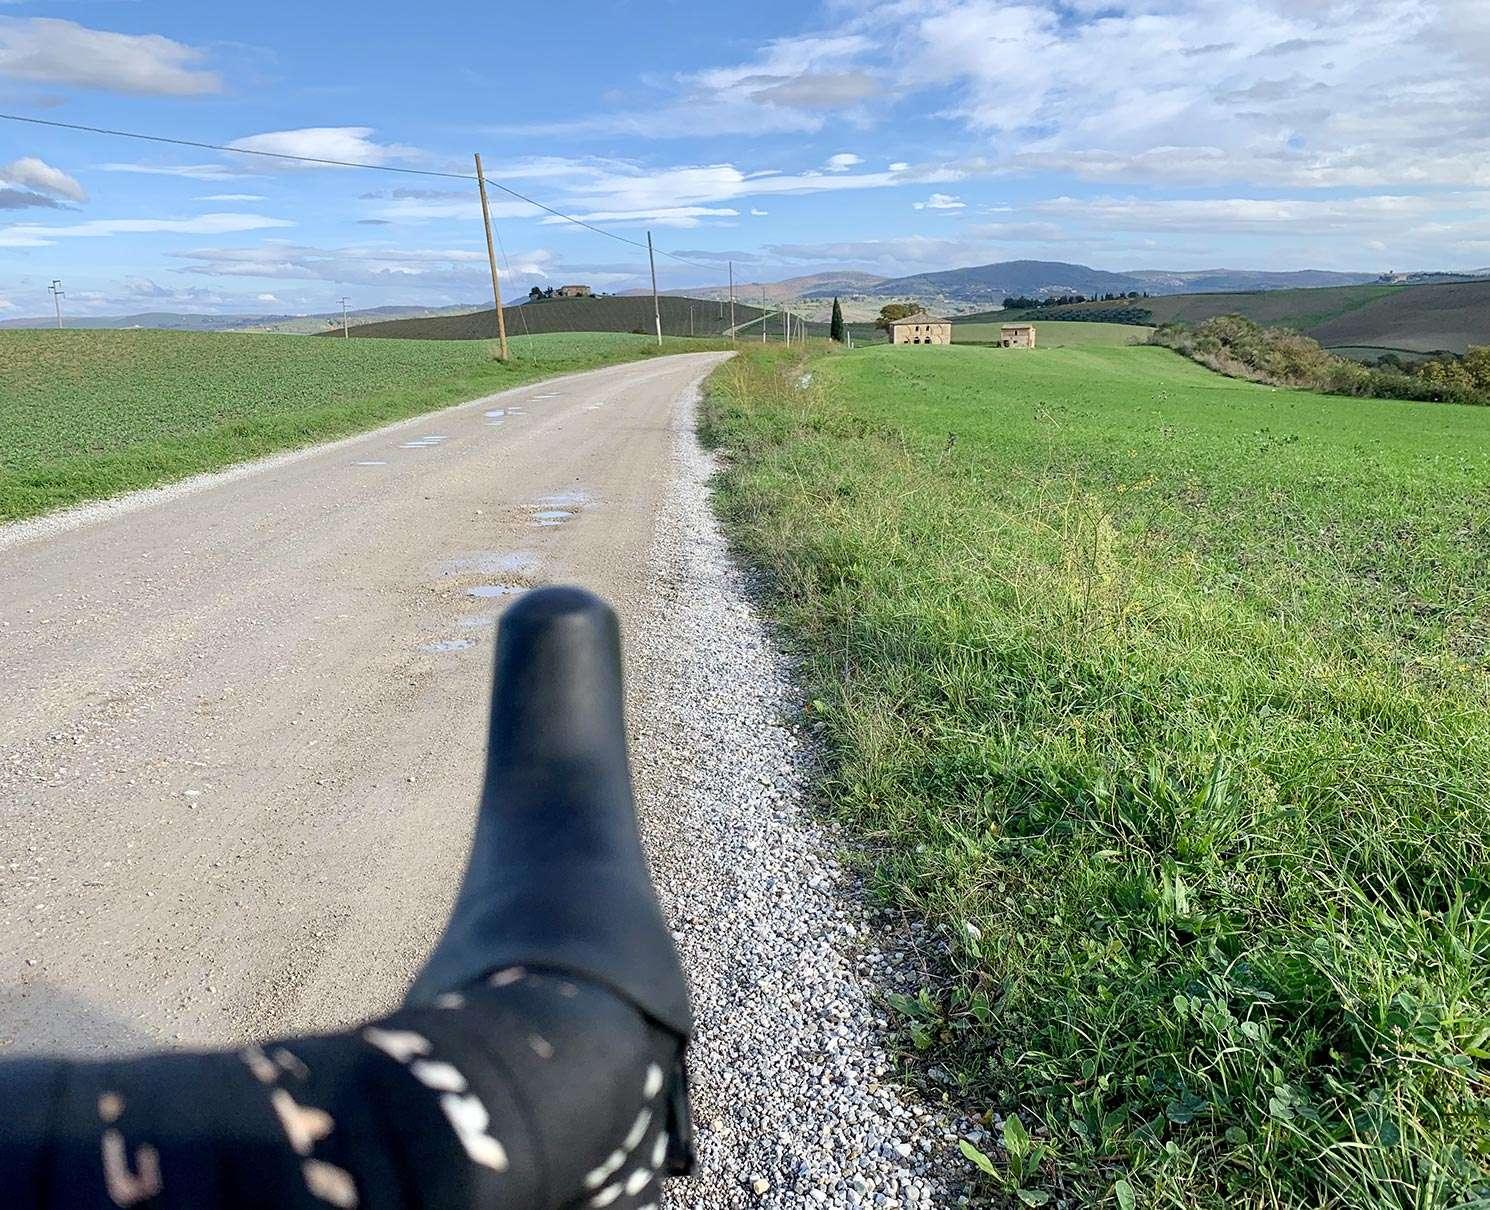 Crete Senesi gravel tuscany bike tour Pienza